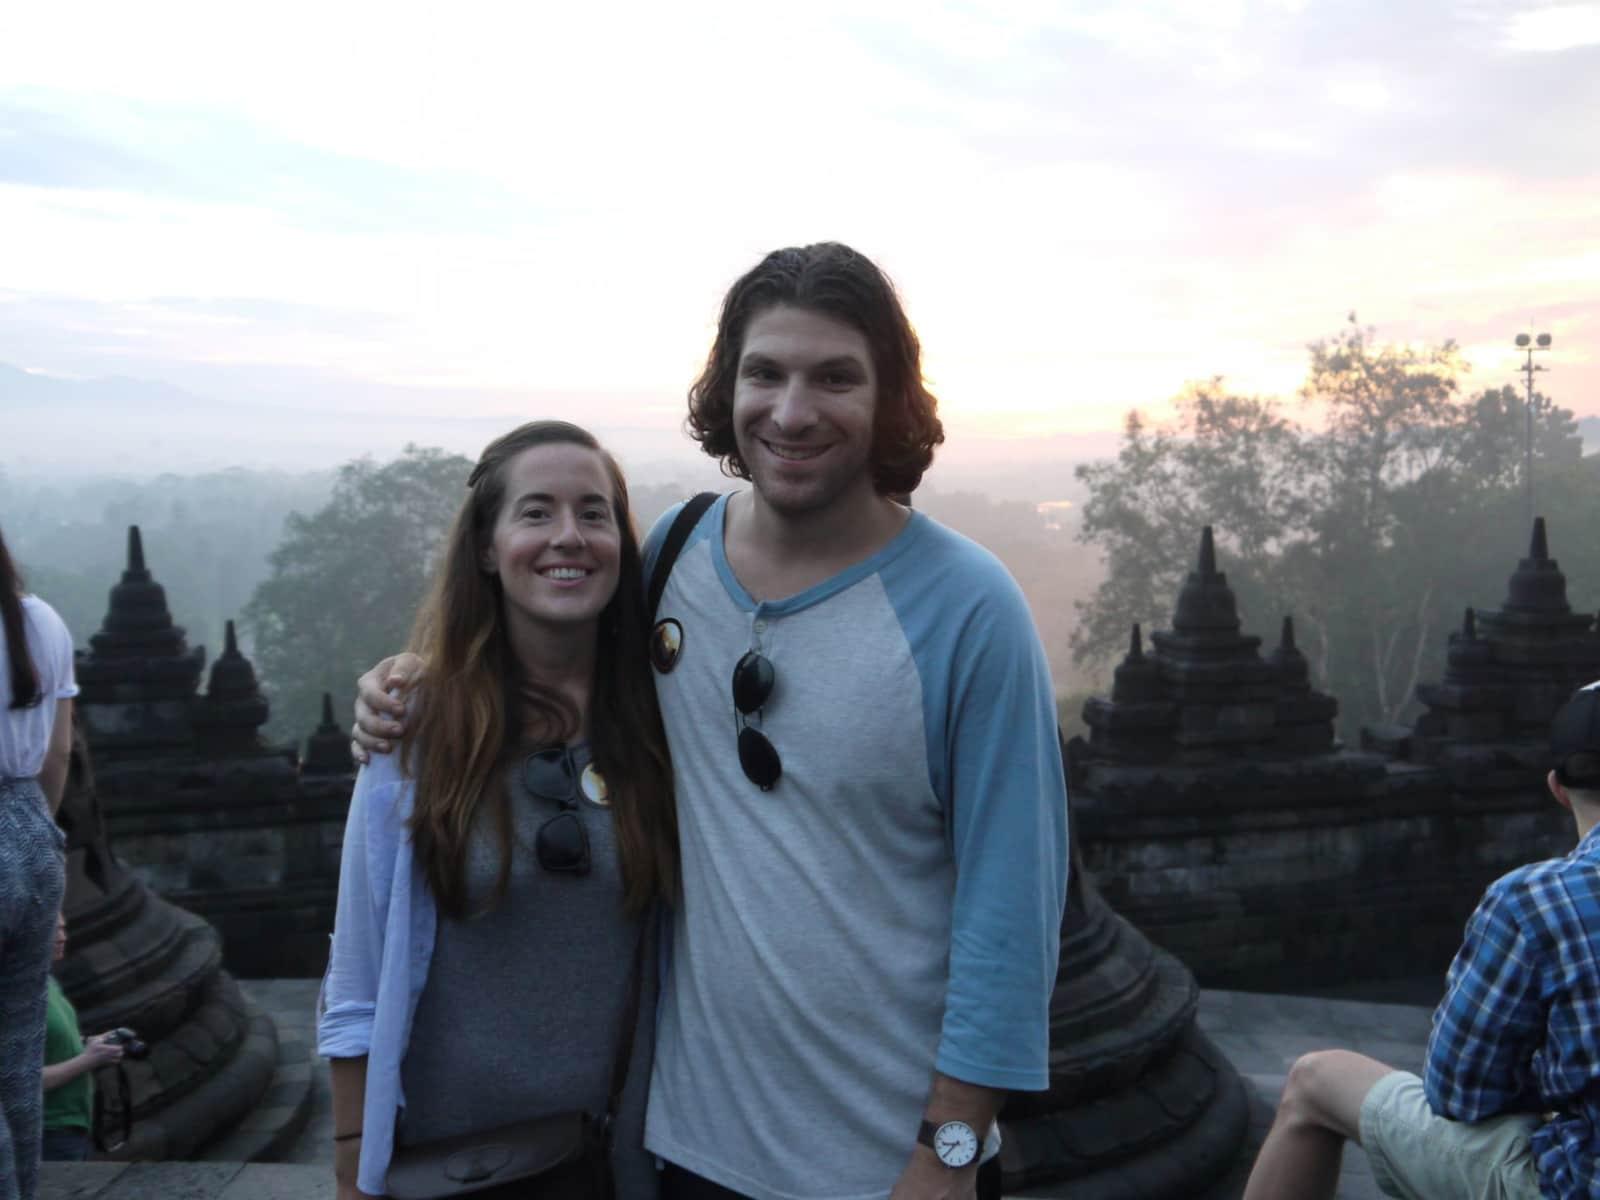 Michelle & Ben from Tokyo, Japan